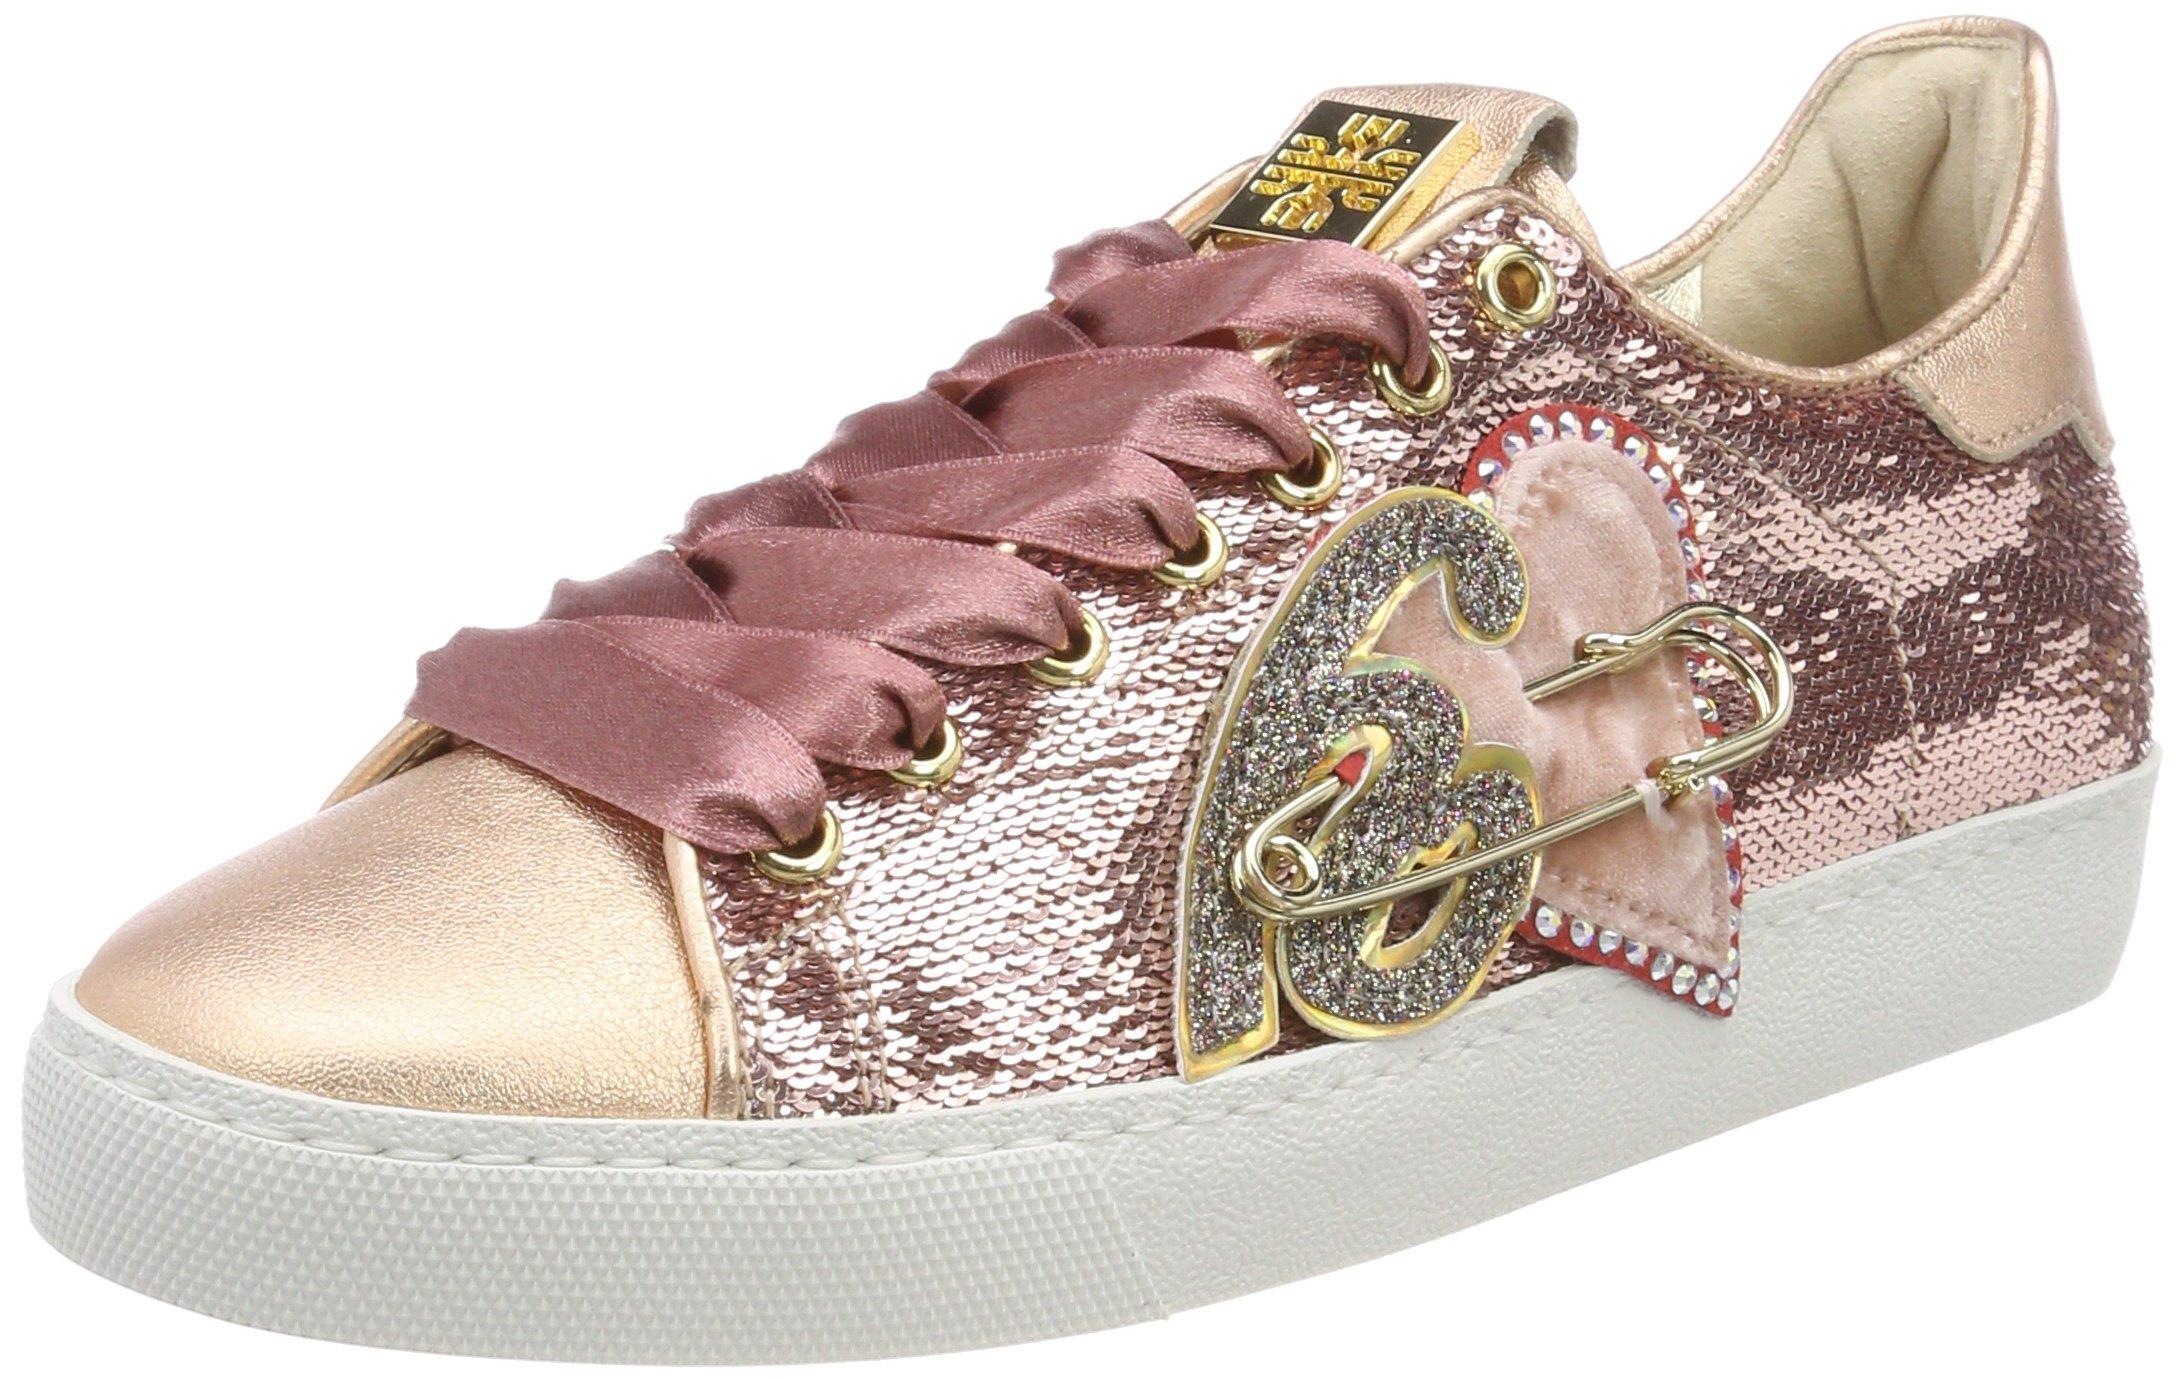 Högl 0328Sneakers Basses FemmeBeigerose38 5 10 5 Eu deoCrBWQx